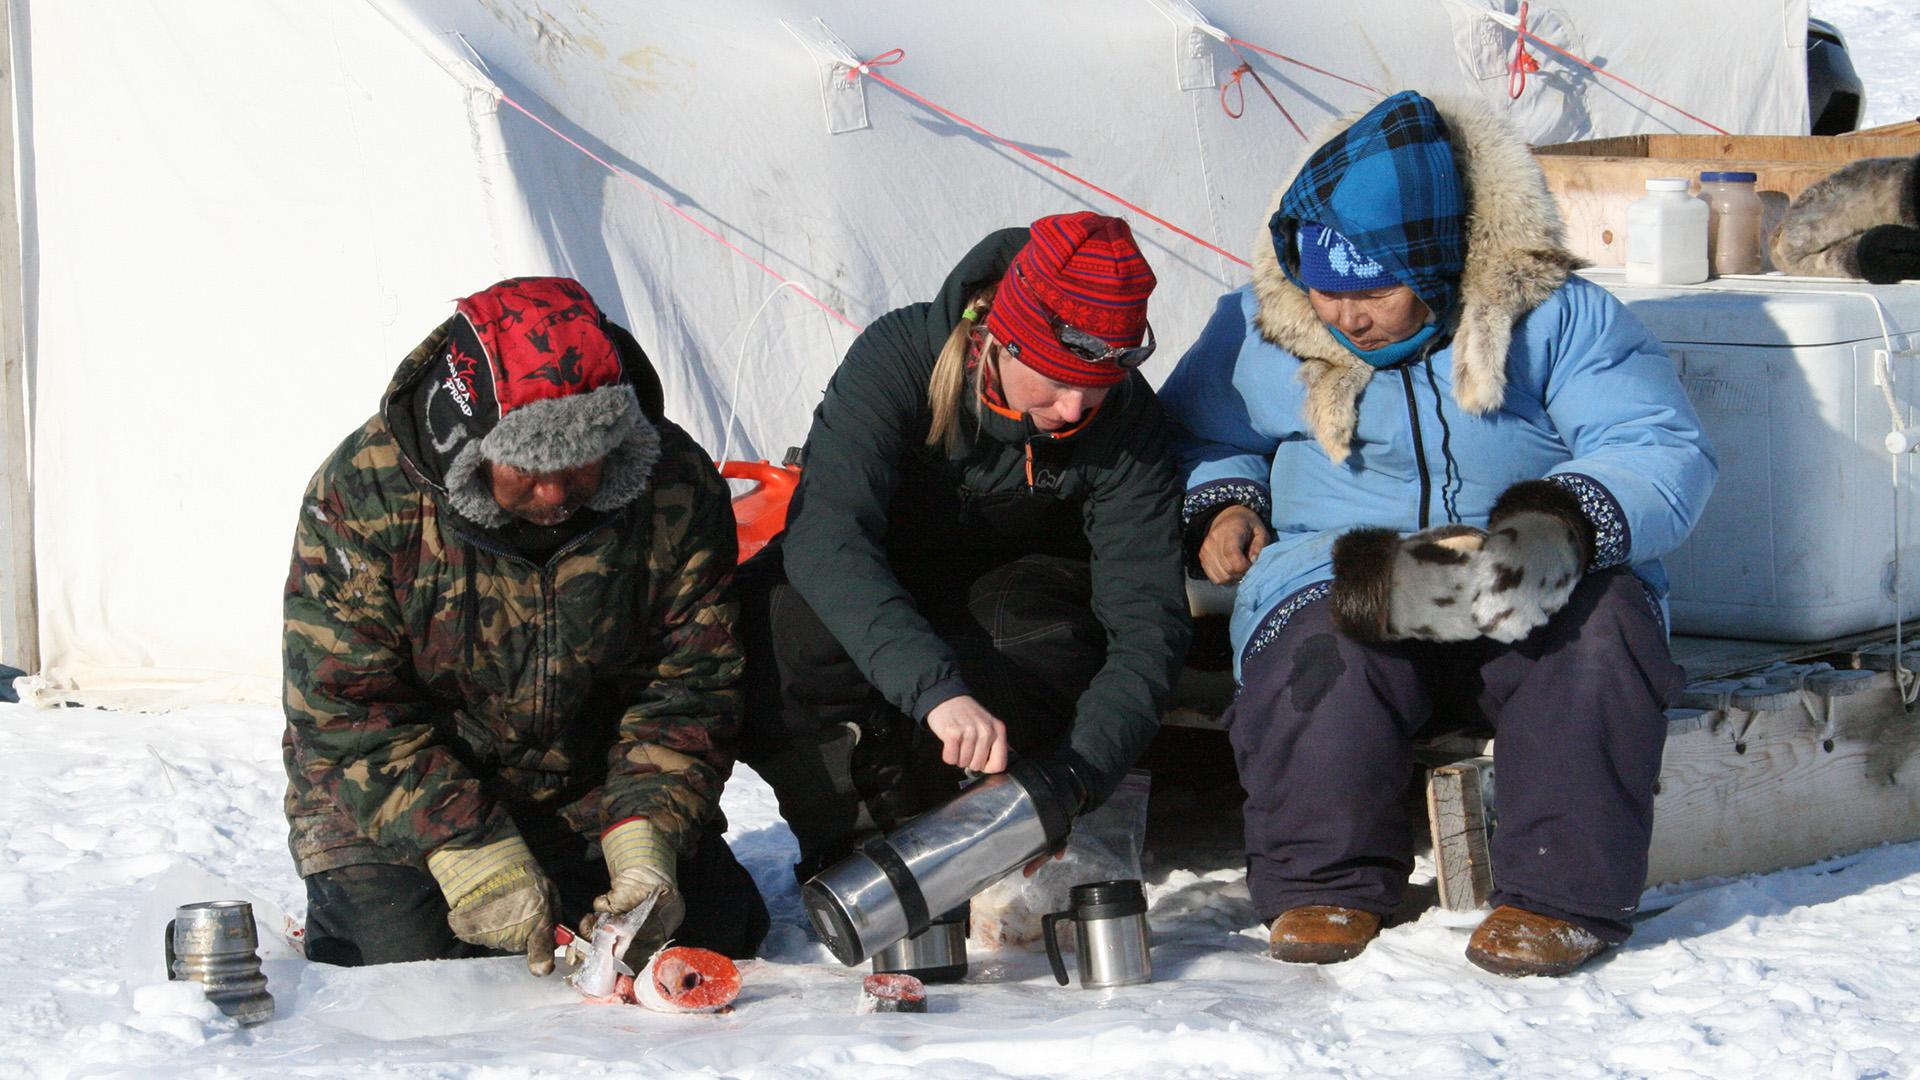 Nunavut researcher awarded Pew marine fellowship